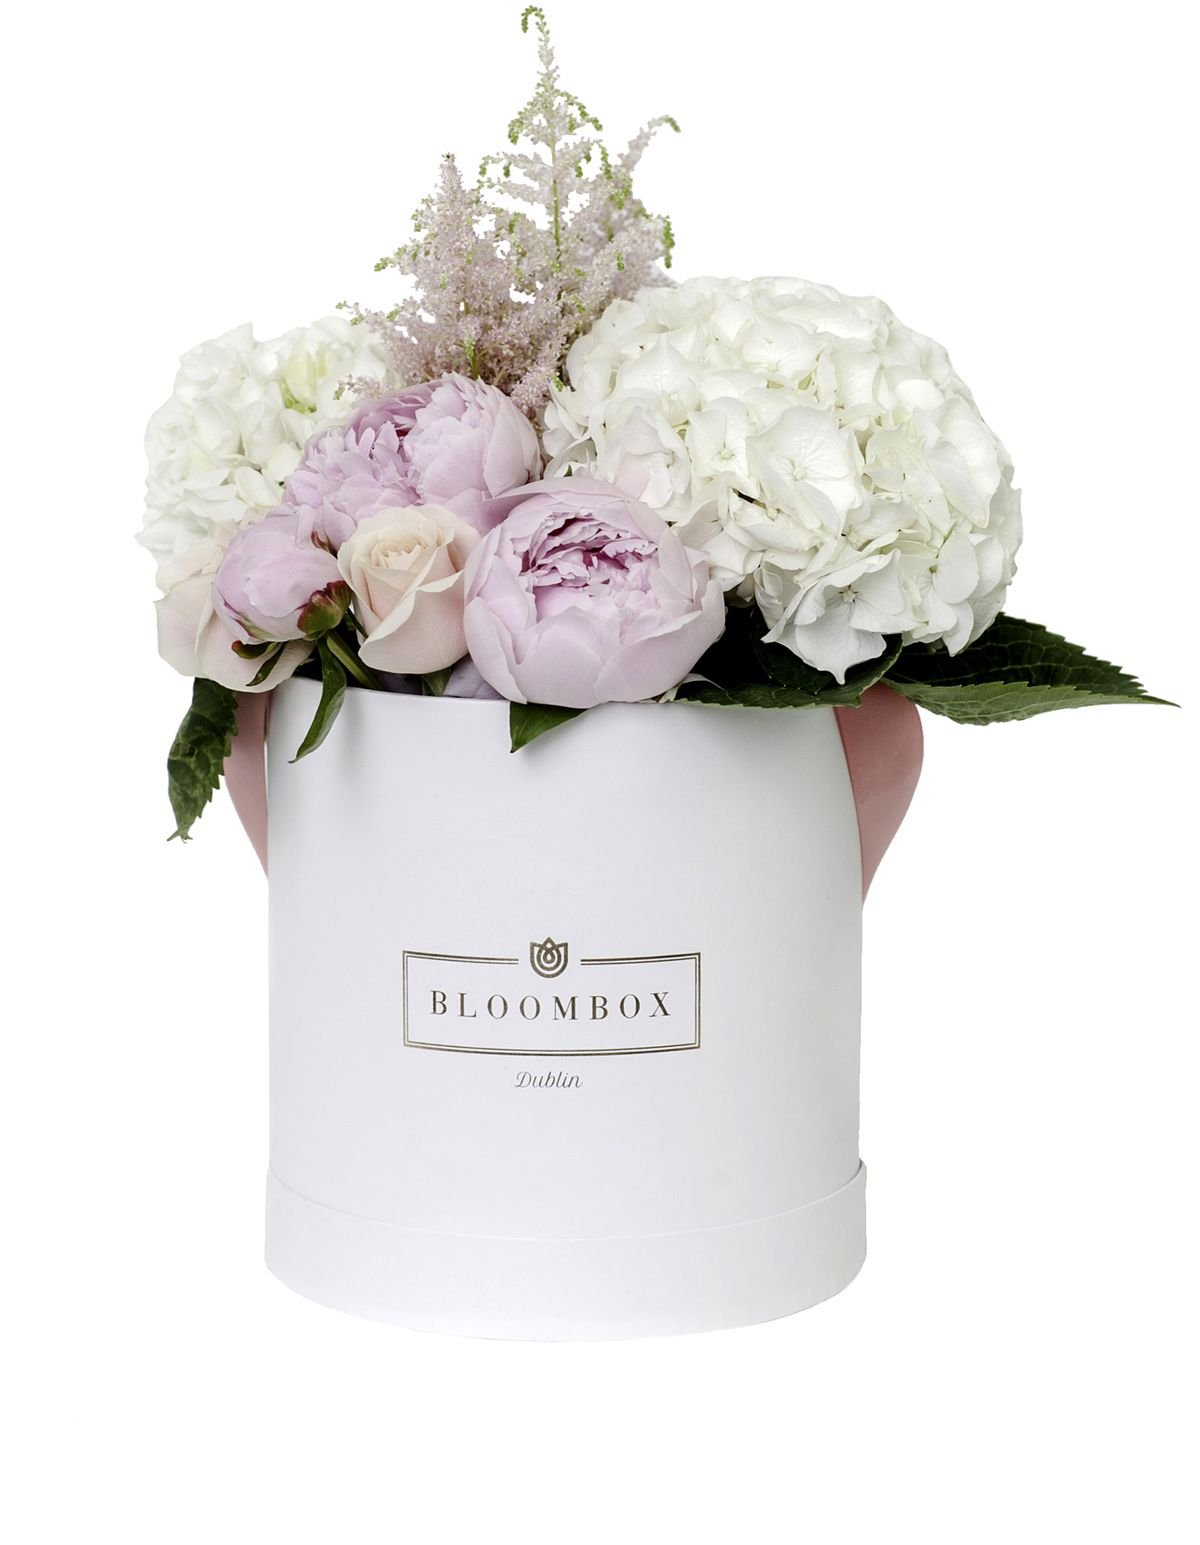 Vanity daydream bloombox dublins first luxury flower delivery vanity daydream bloombox dublins first luxury flower delivery roses luxury flowers flower boxes izmirmasajfo